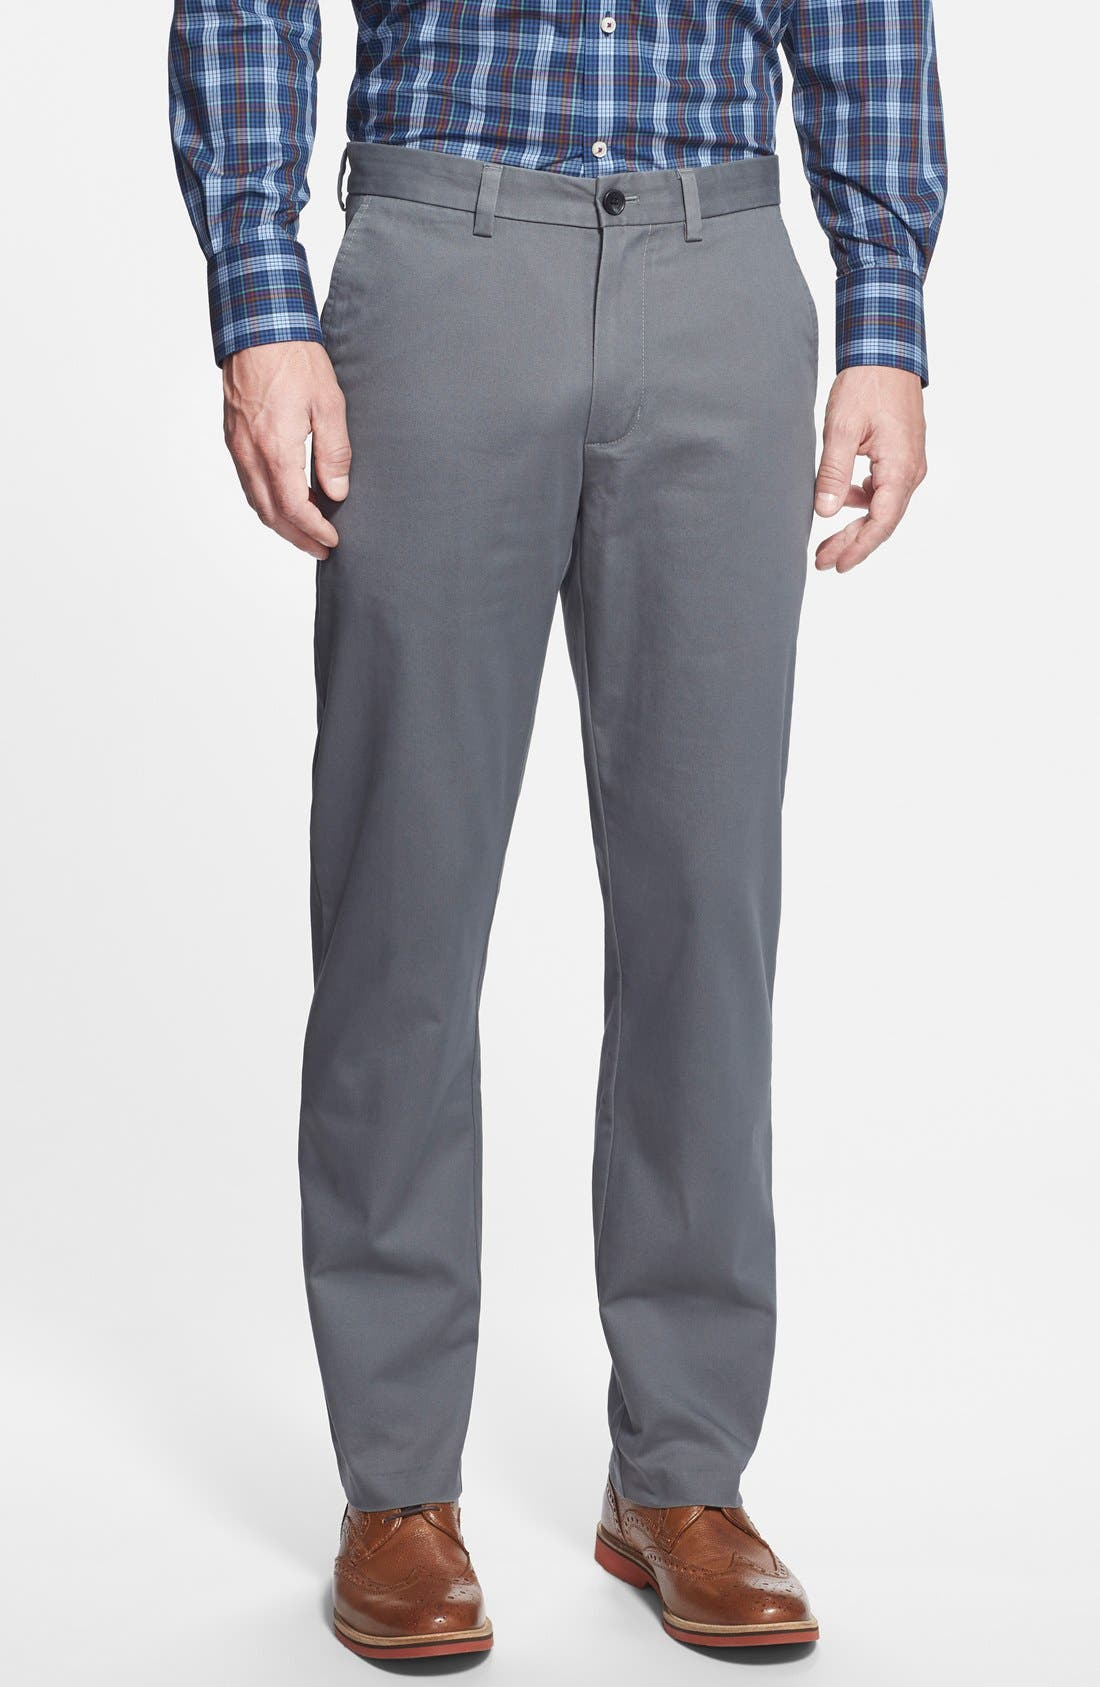 Wrinkle Free Straight Leg Chinos,                         Main,                         color, GREY CASTLEROCK